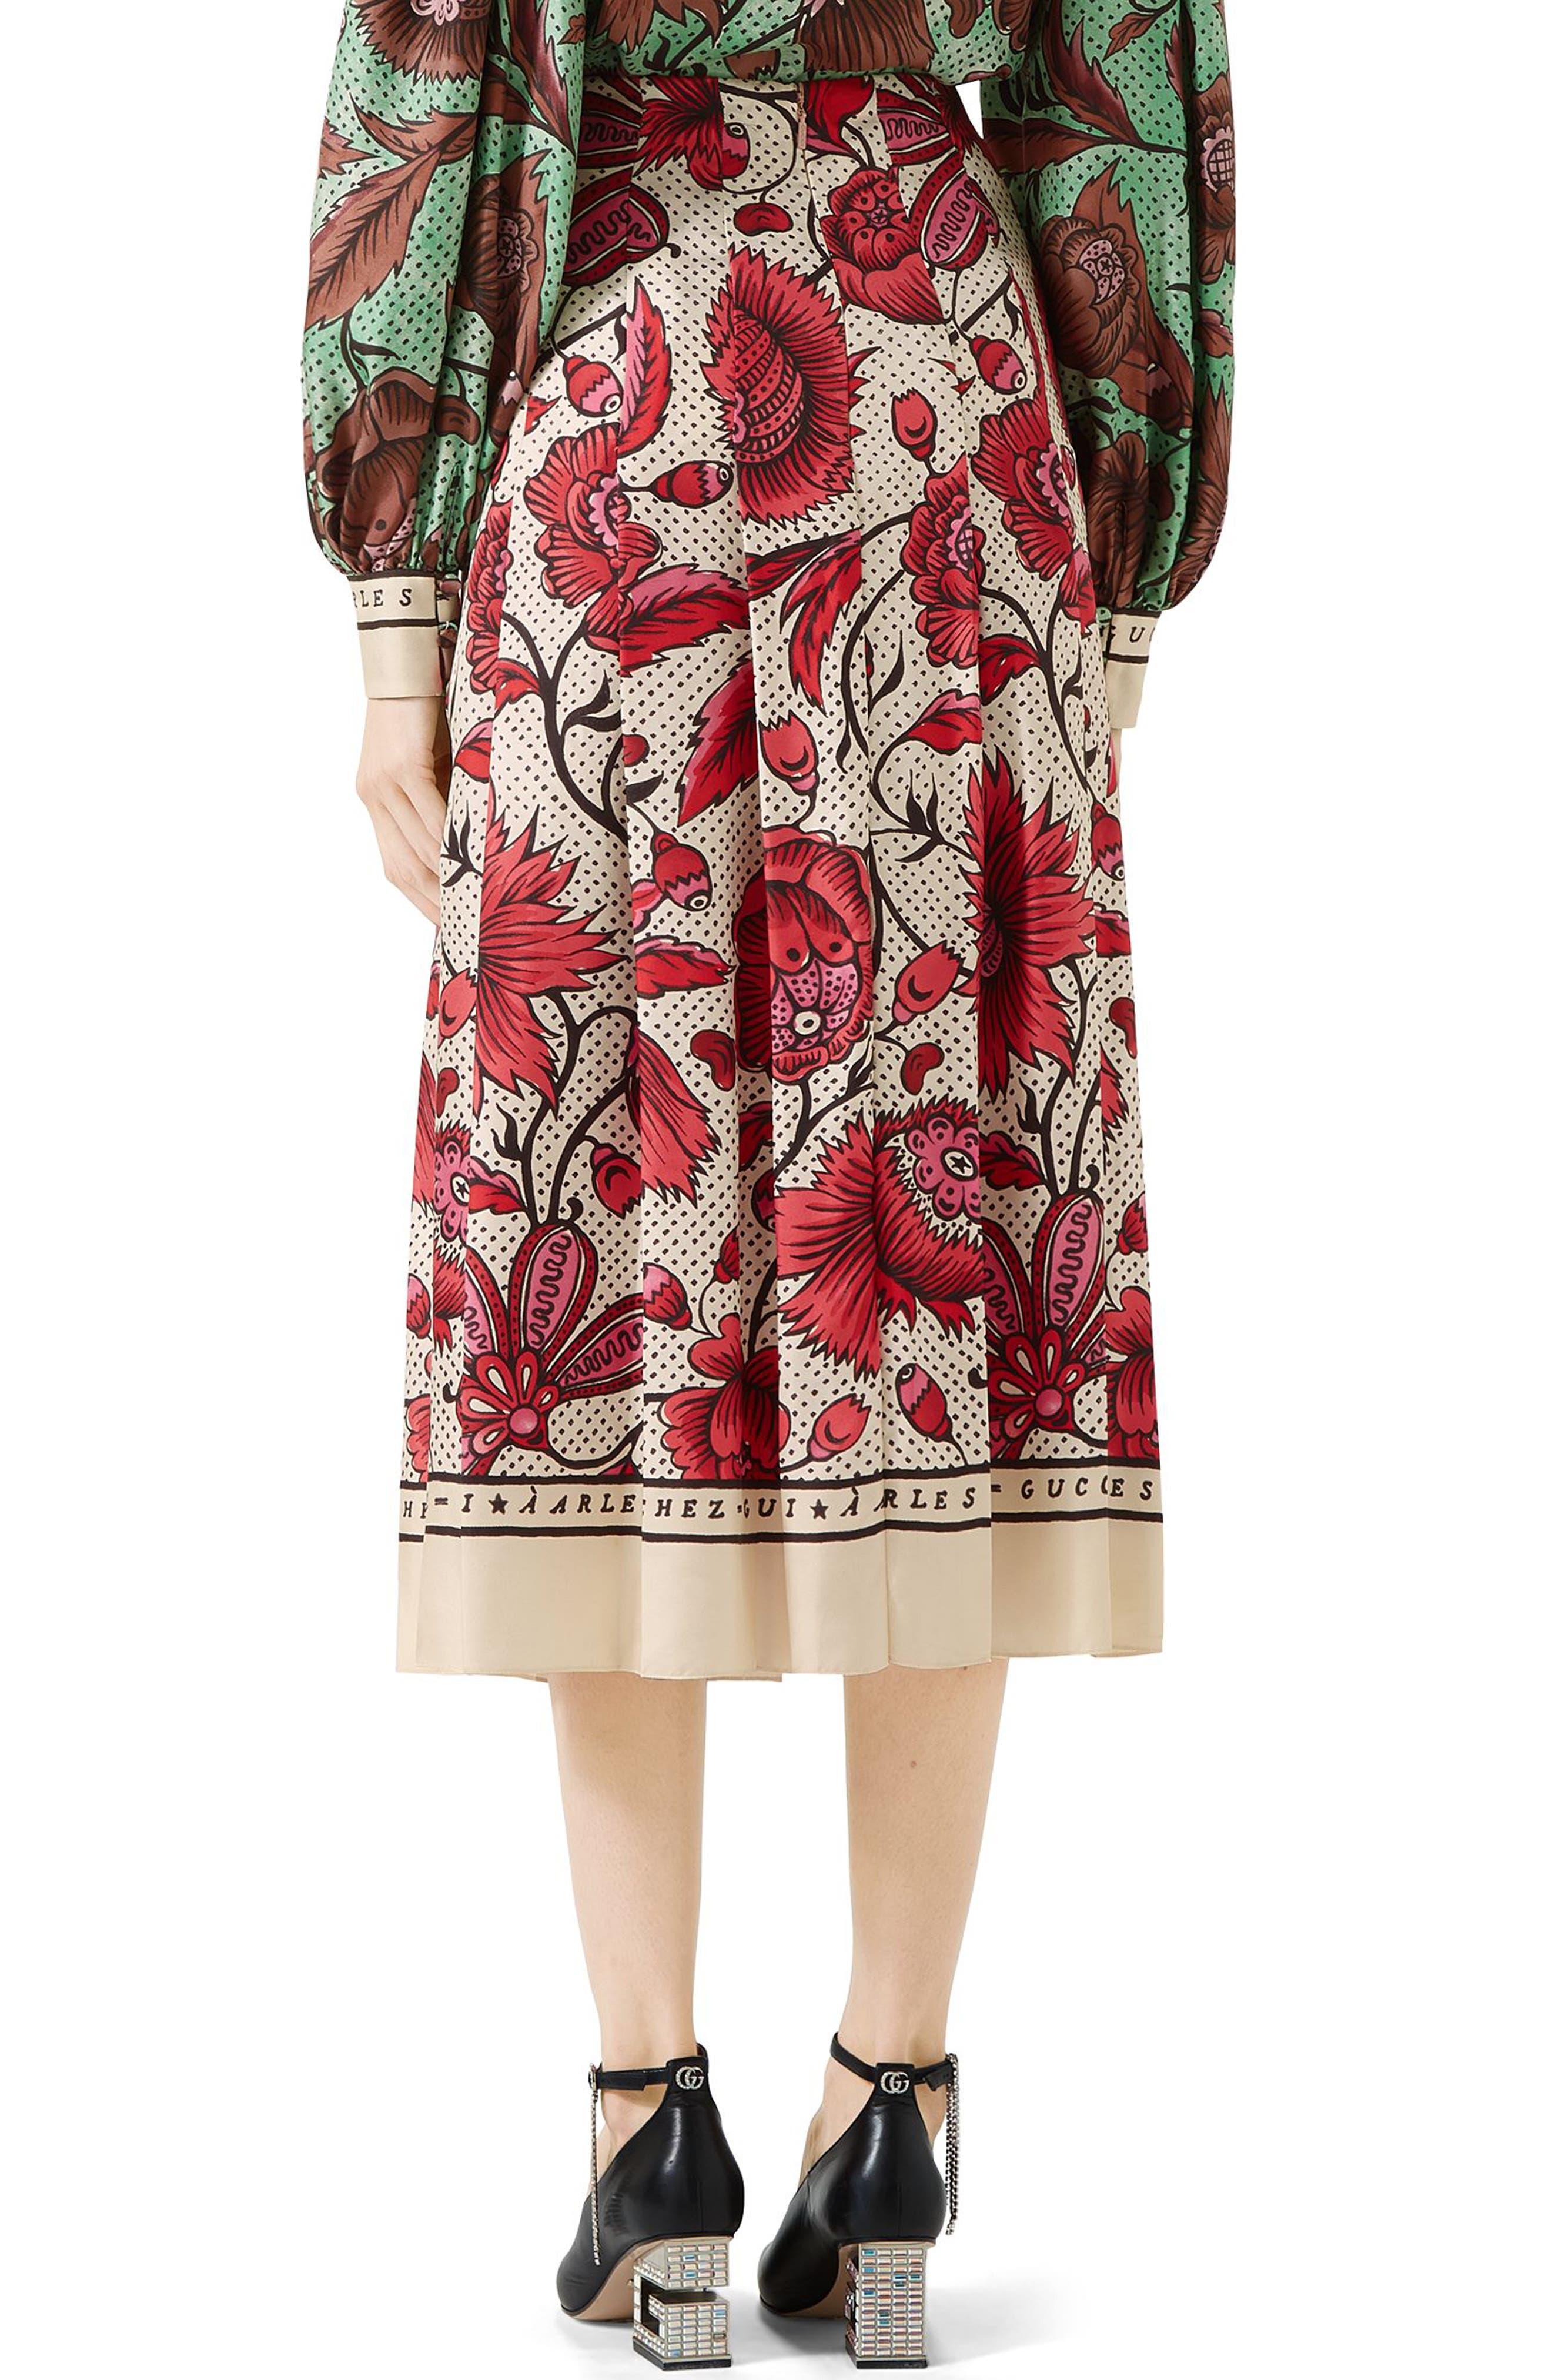 Watercolor Floral Print Pleated Silk Twill Midi Skirt,                             Alternate thumbnail 2, color,                             5349 FUCHSIA/ IVORY PRINTE